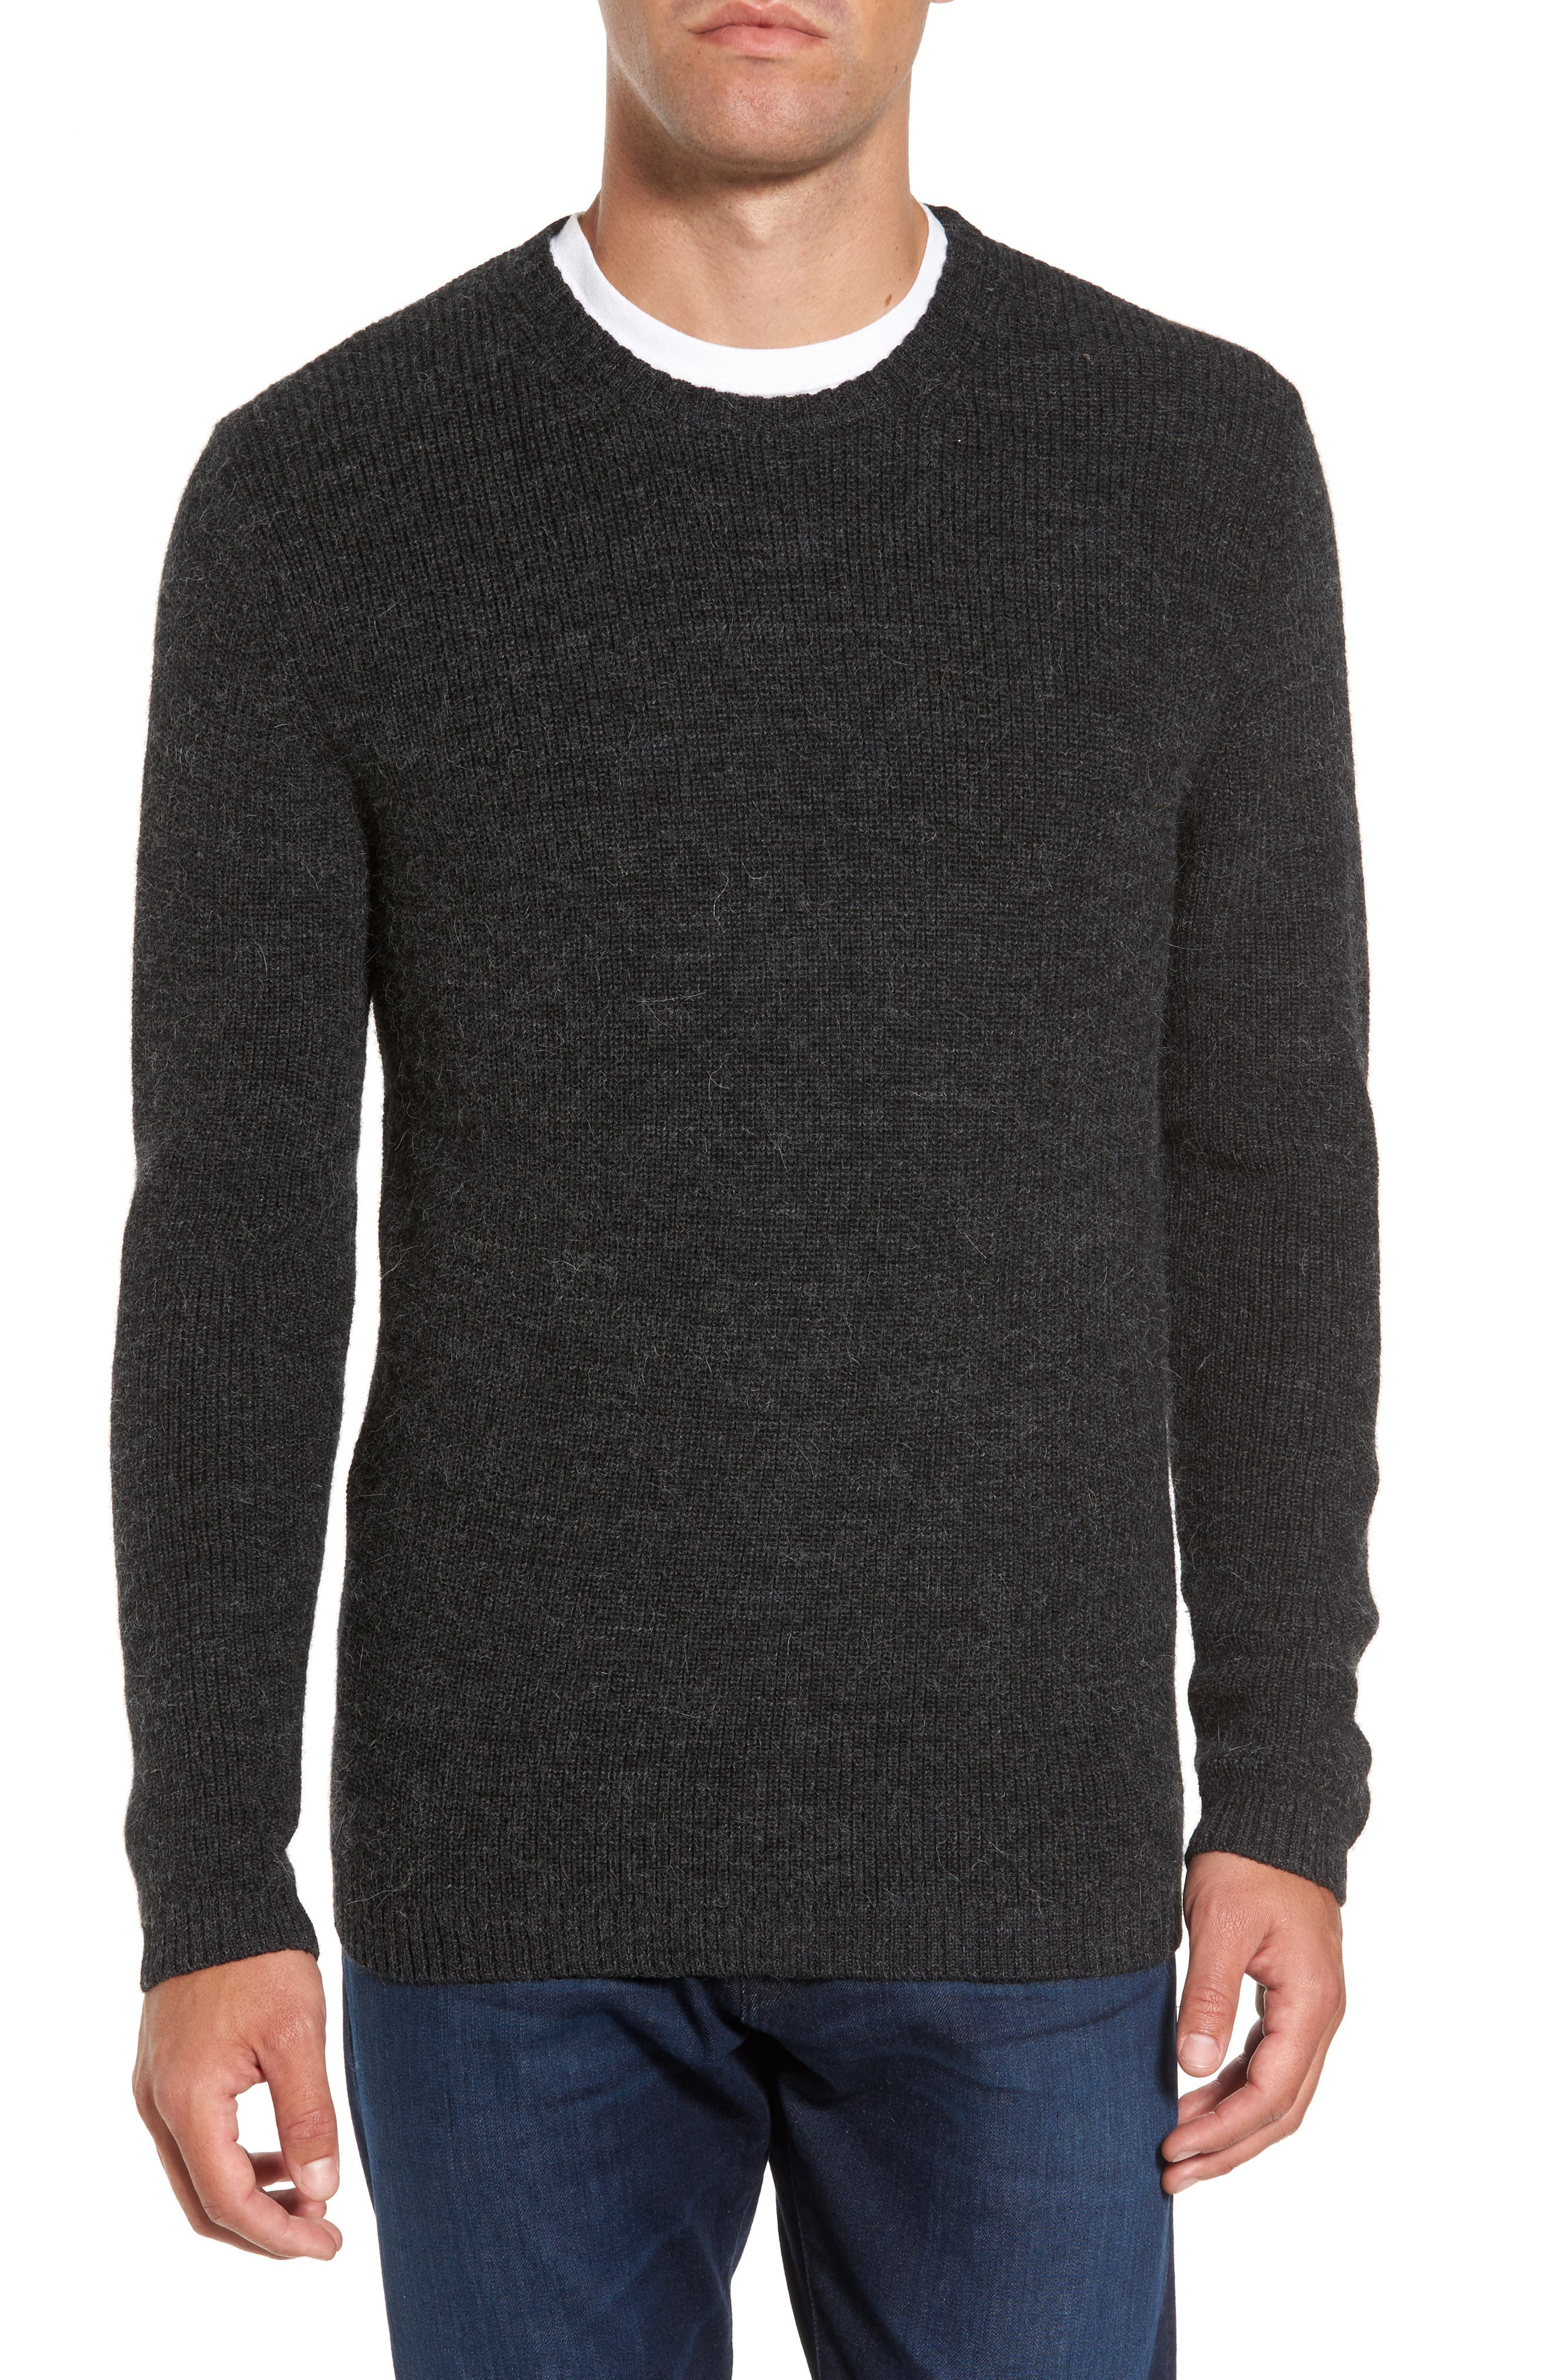 Whalers Bay Merino Wool Blend Sweater,                         Main,                         color, Onyx